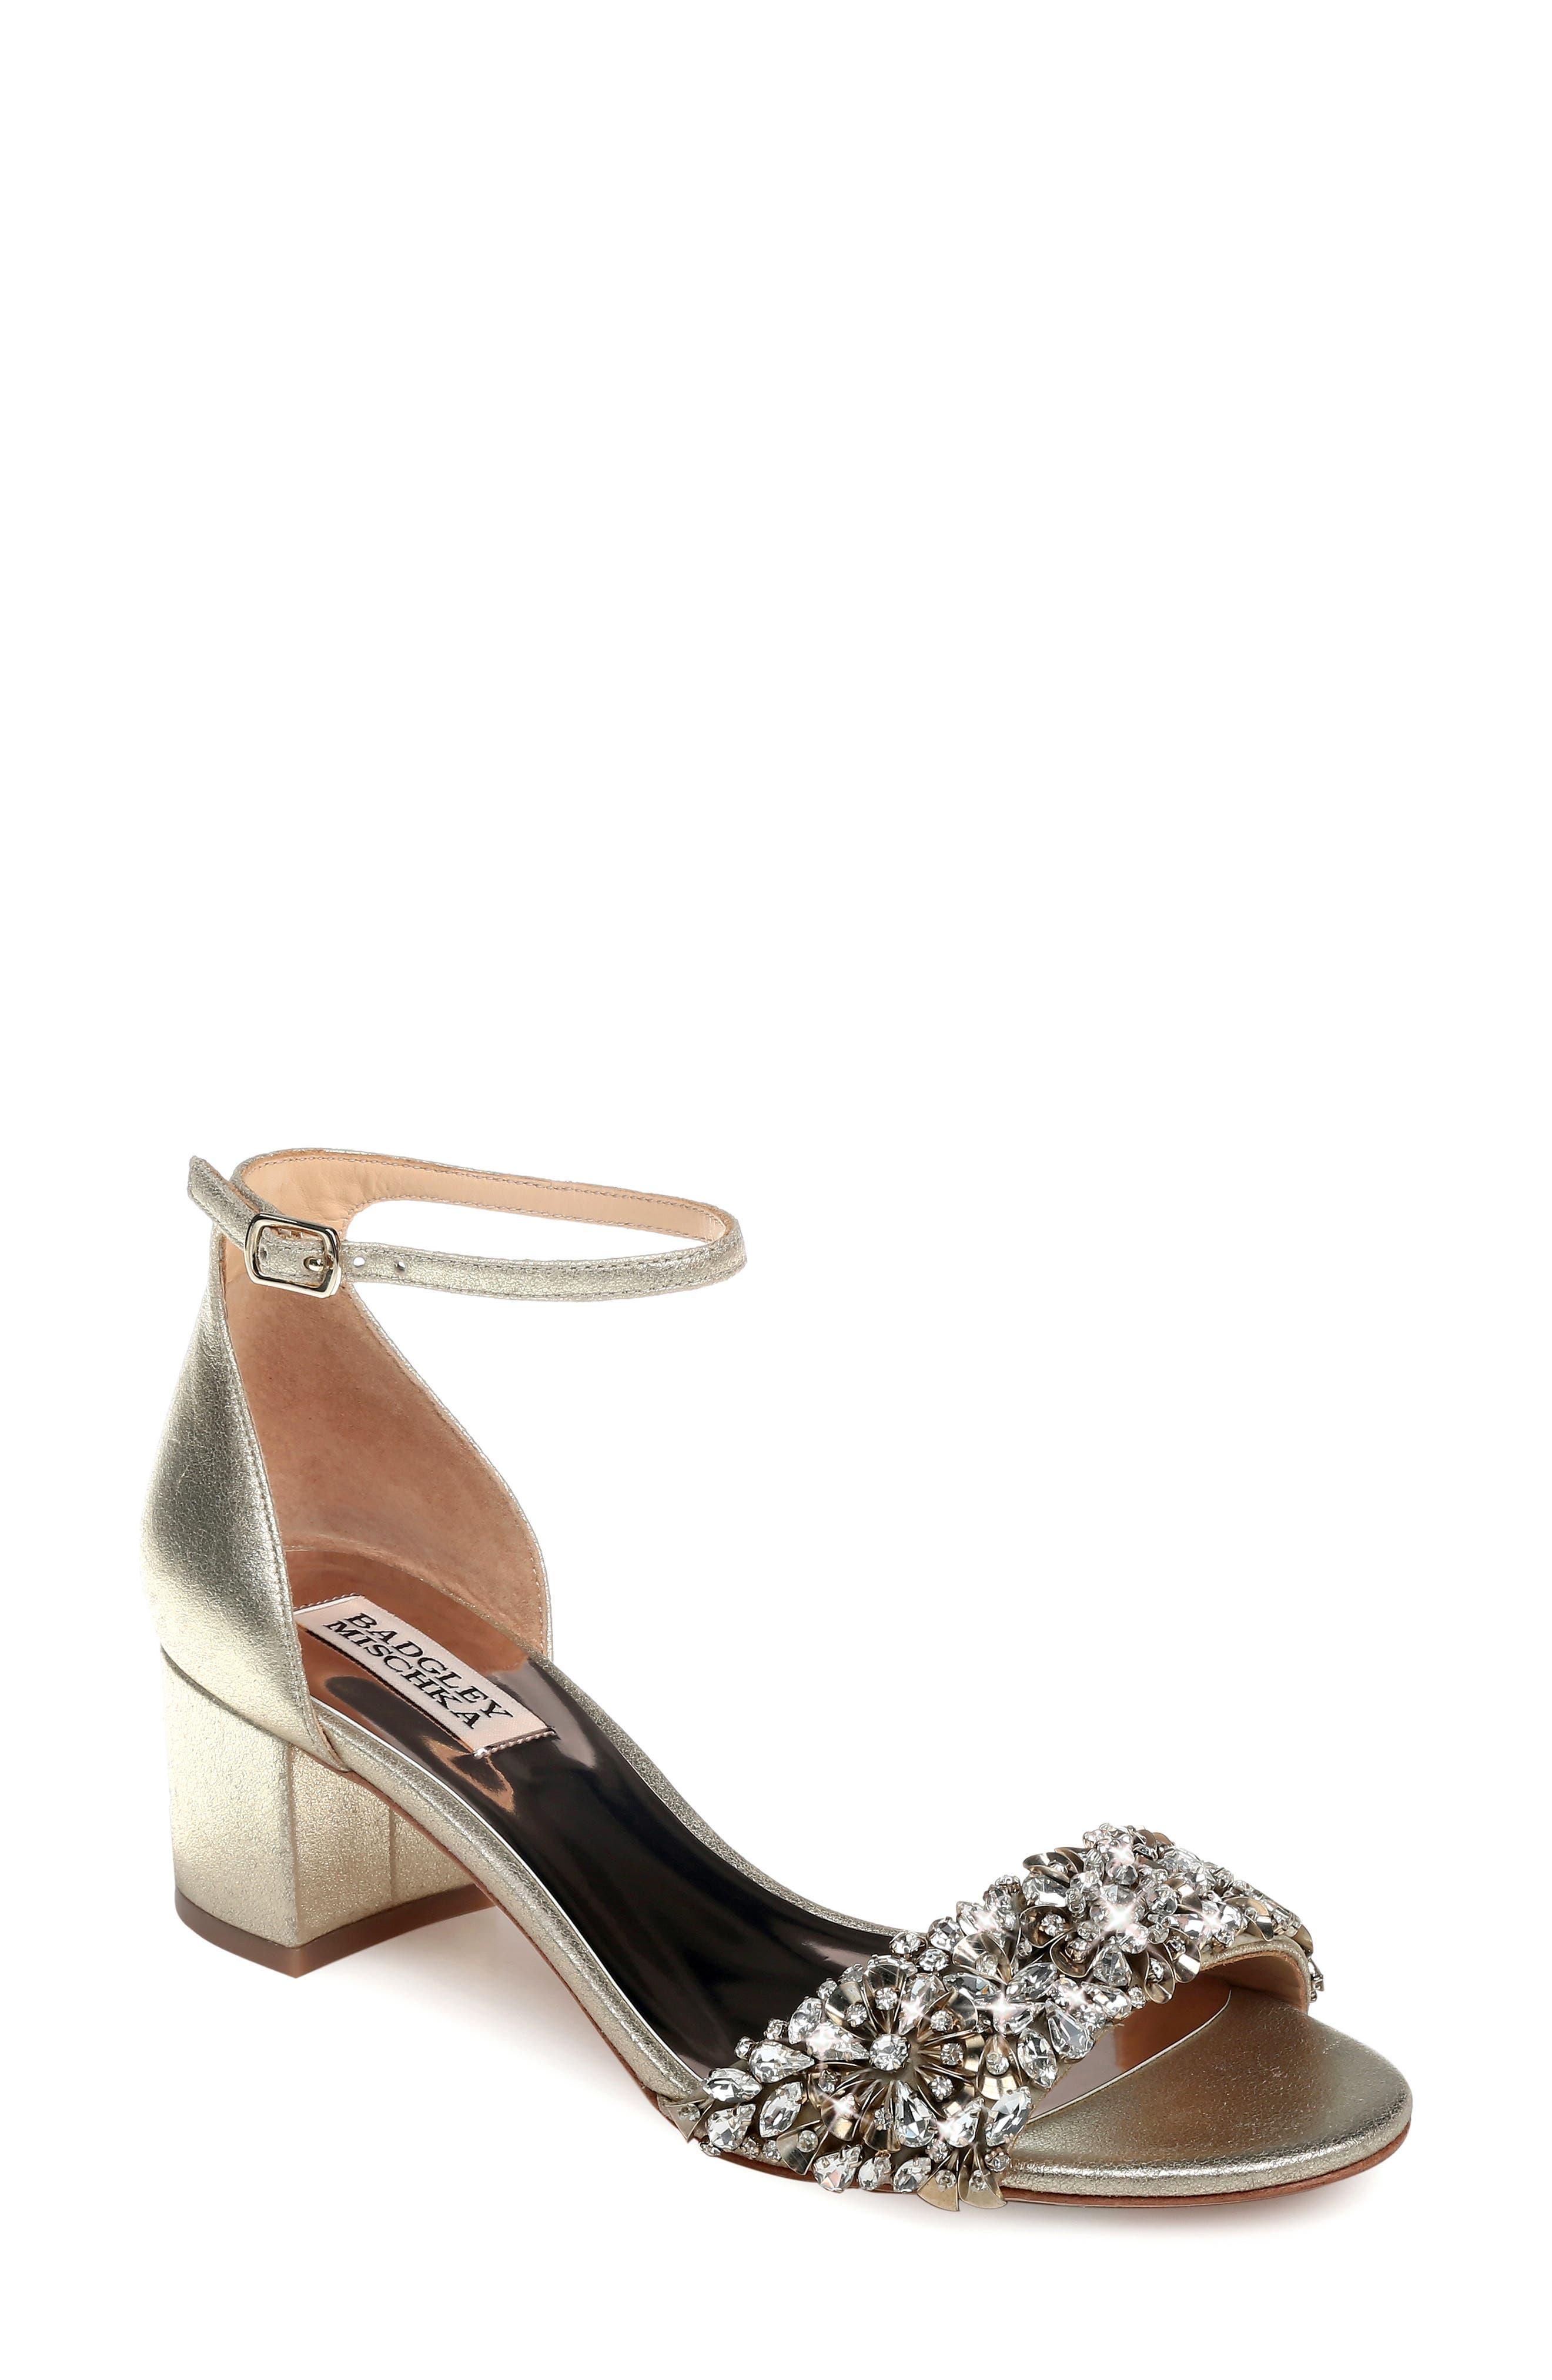 Badgley Mischka Vega Ii Metallic Sandal, Metallic